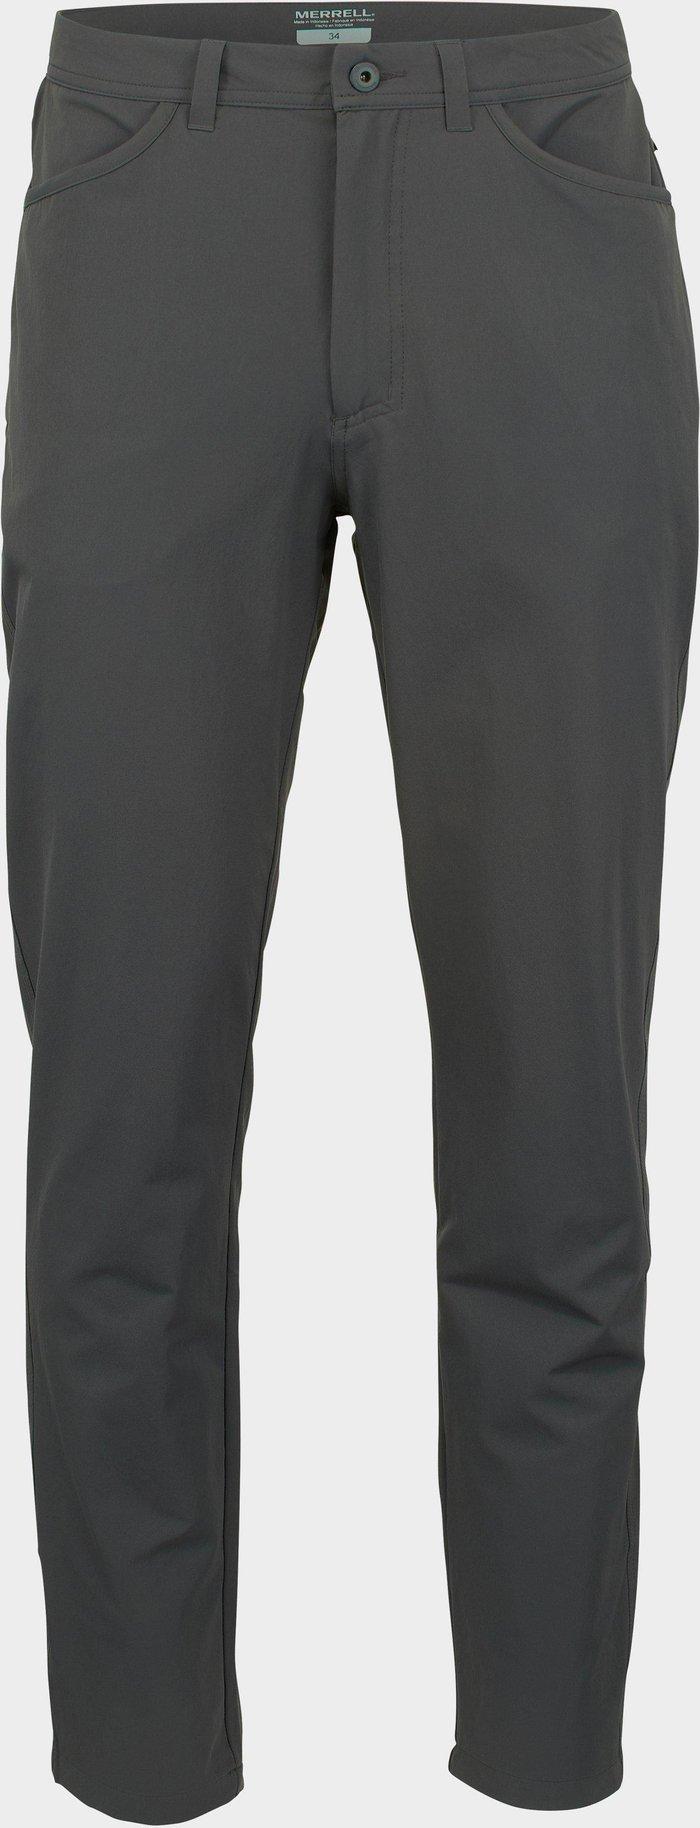 Merrell Men's Capture Pants, Mid Grey/Mid Grey